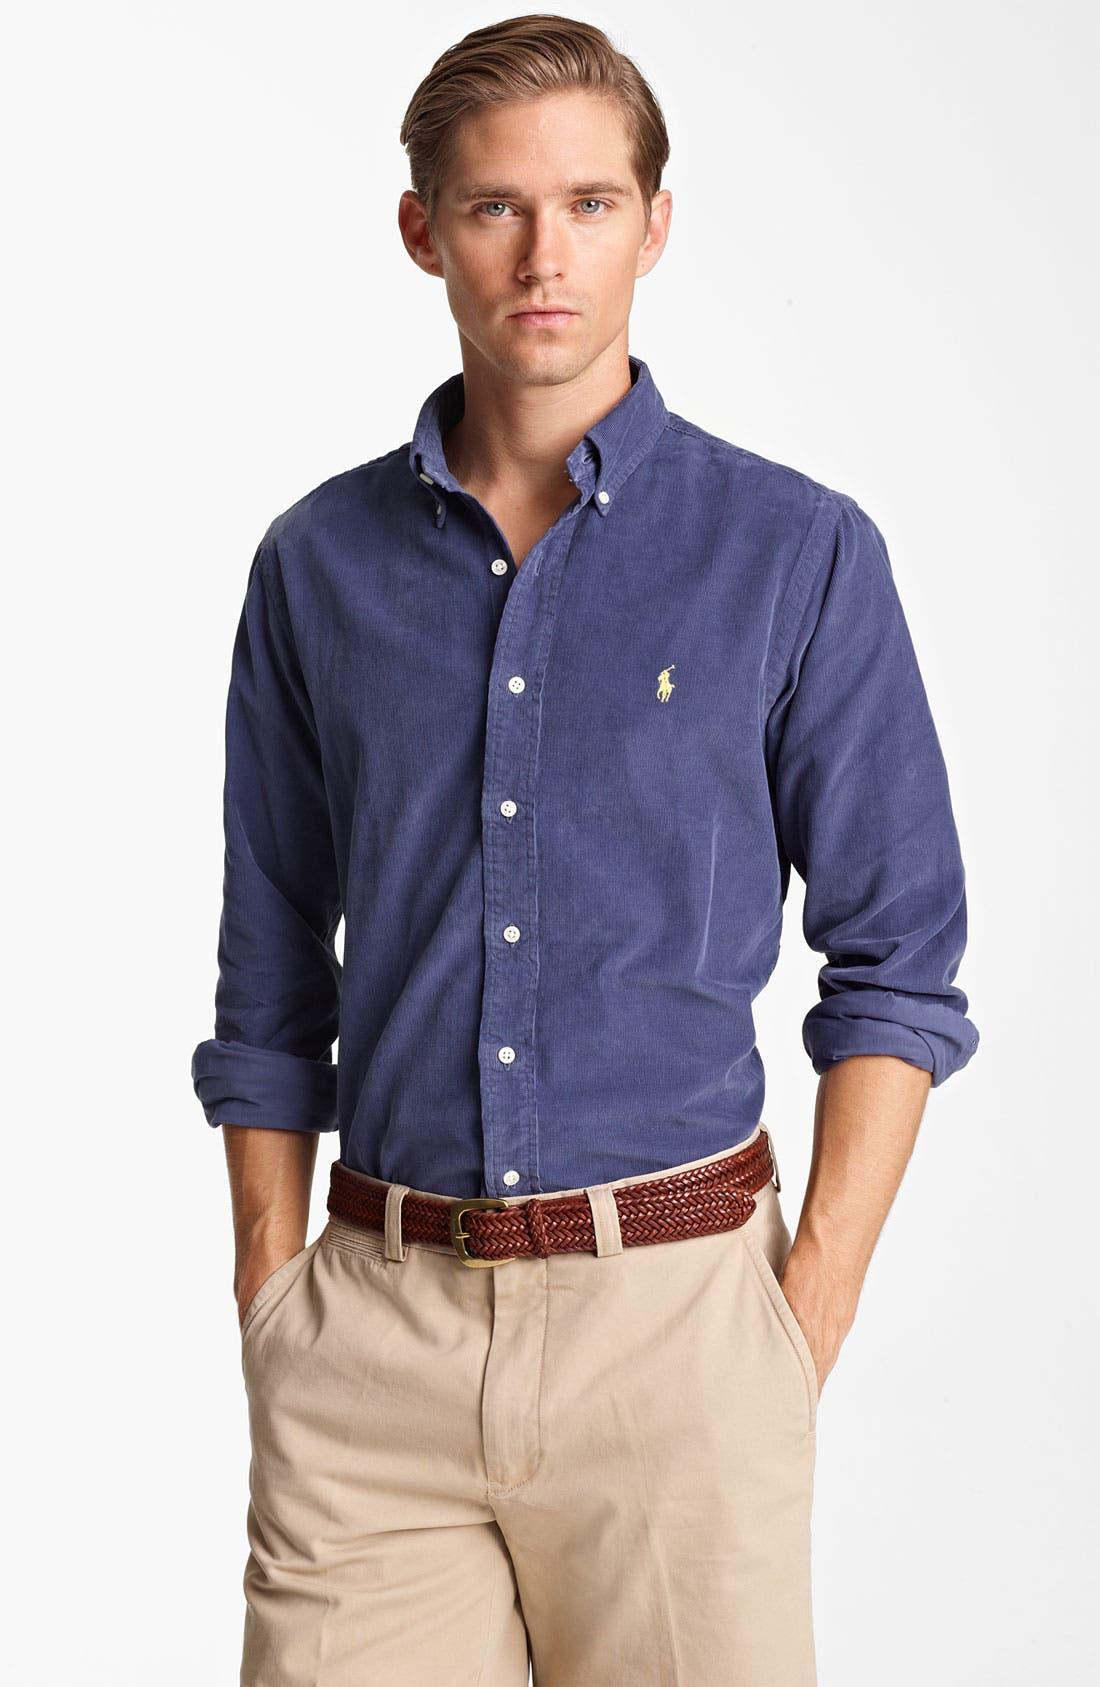 Alternate Image 1 Selected - Polo Ralph Lauren Custom Fit Corduroy Sport Shirt